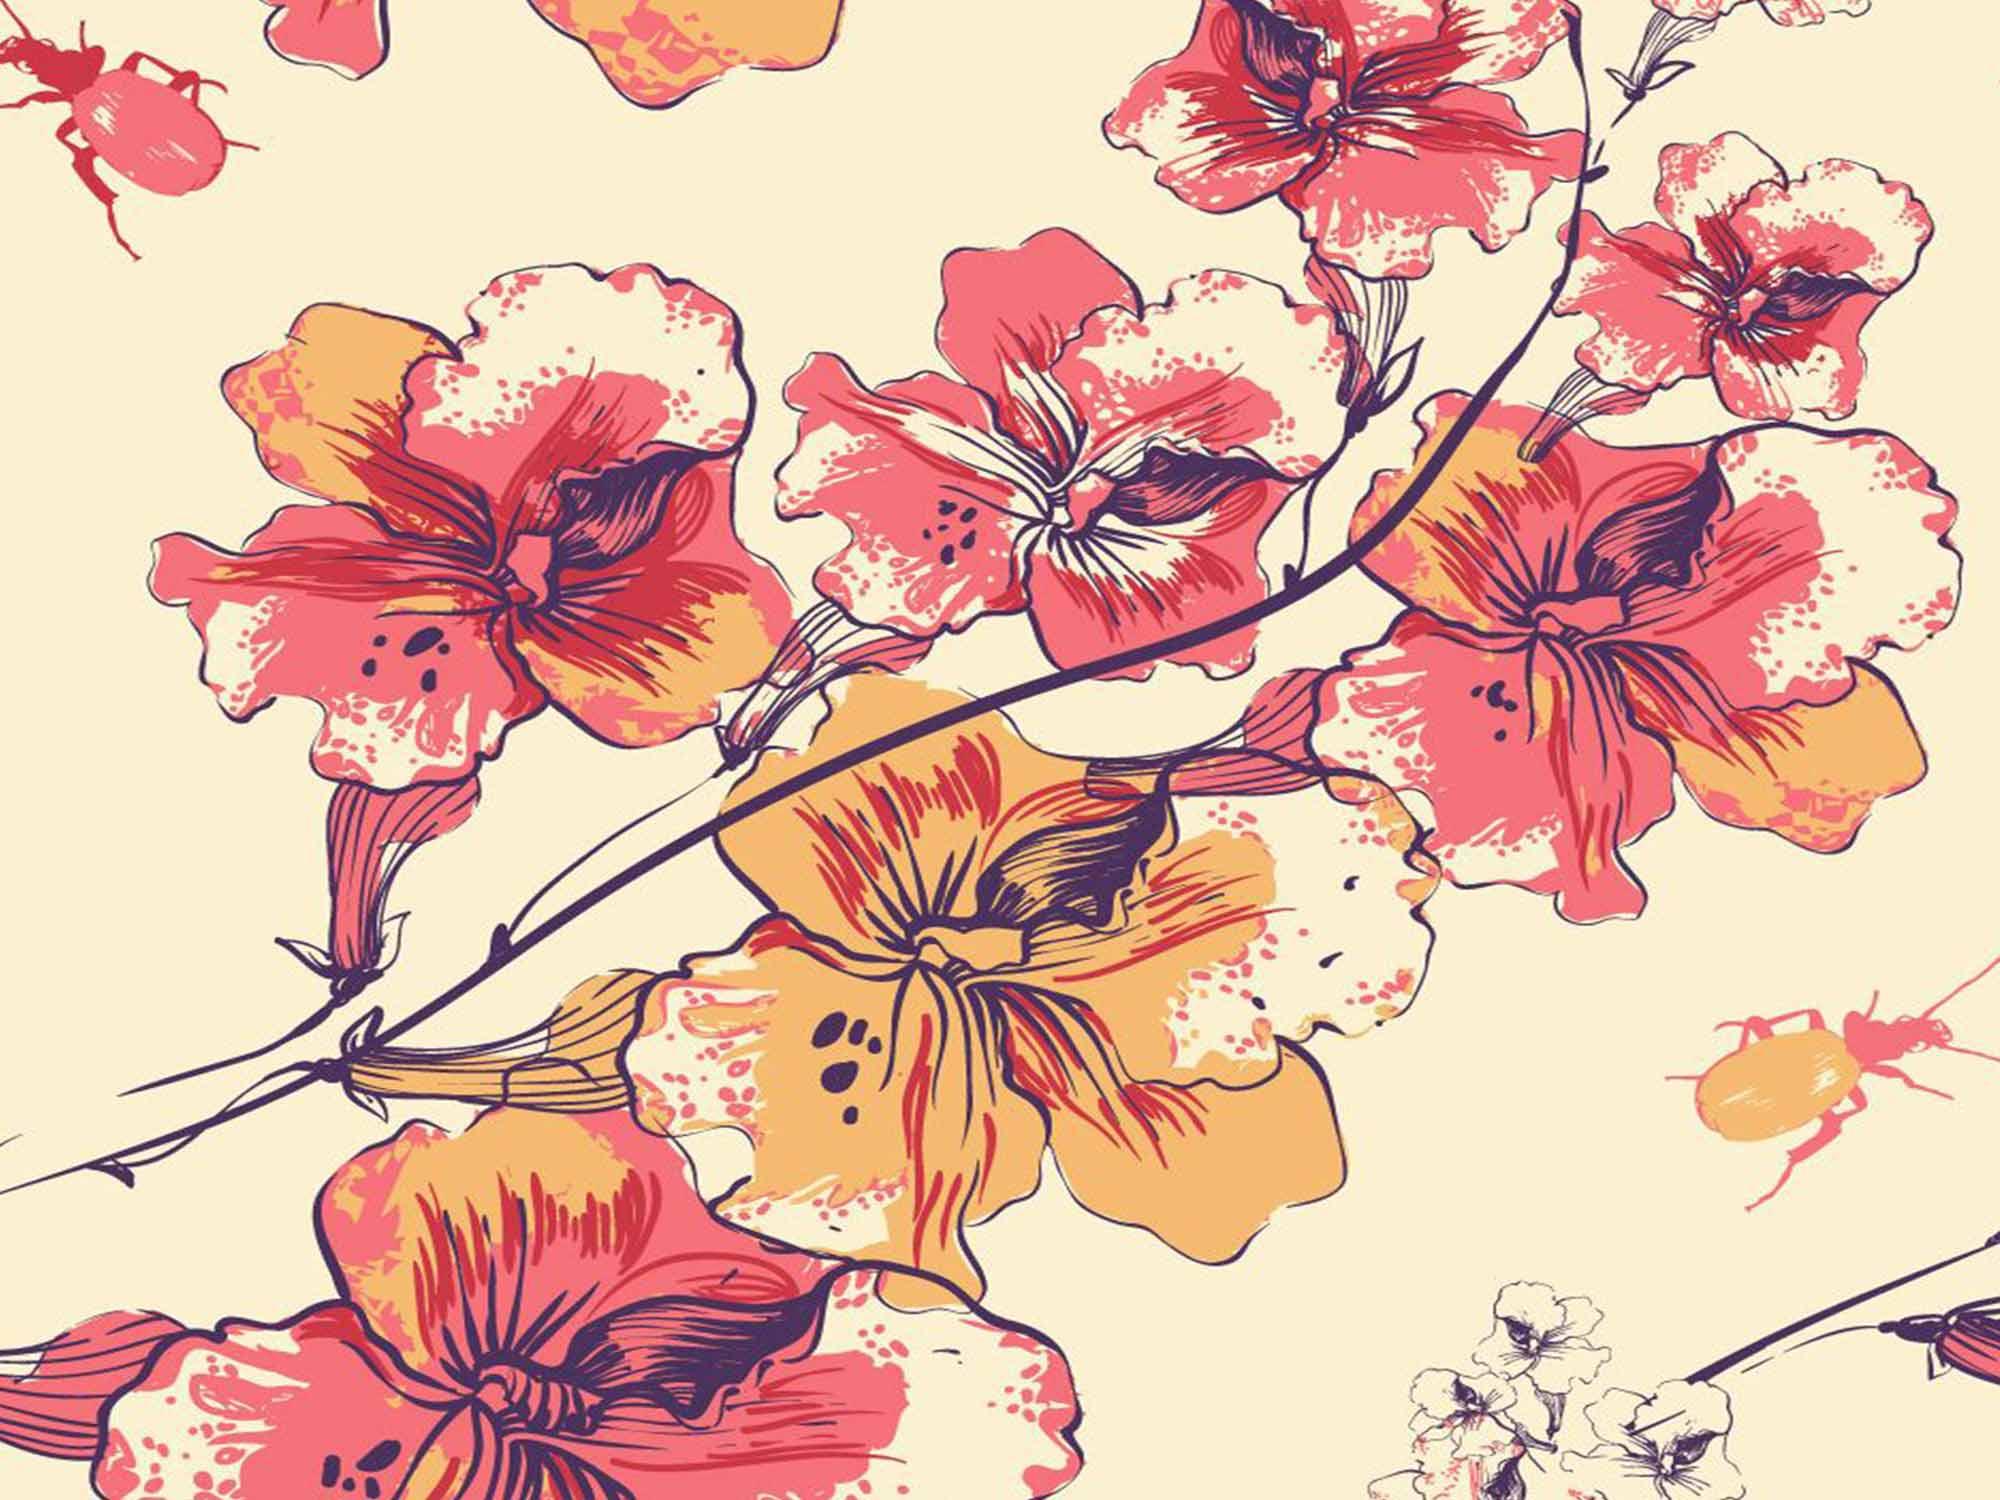 Papel de Parede Floral 0078 - Adesivos de Parede  - Paredes Decoradas